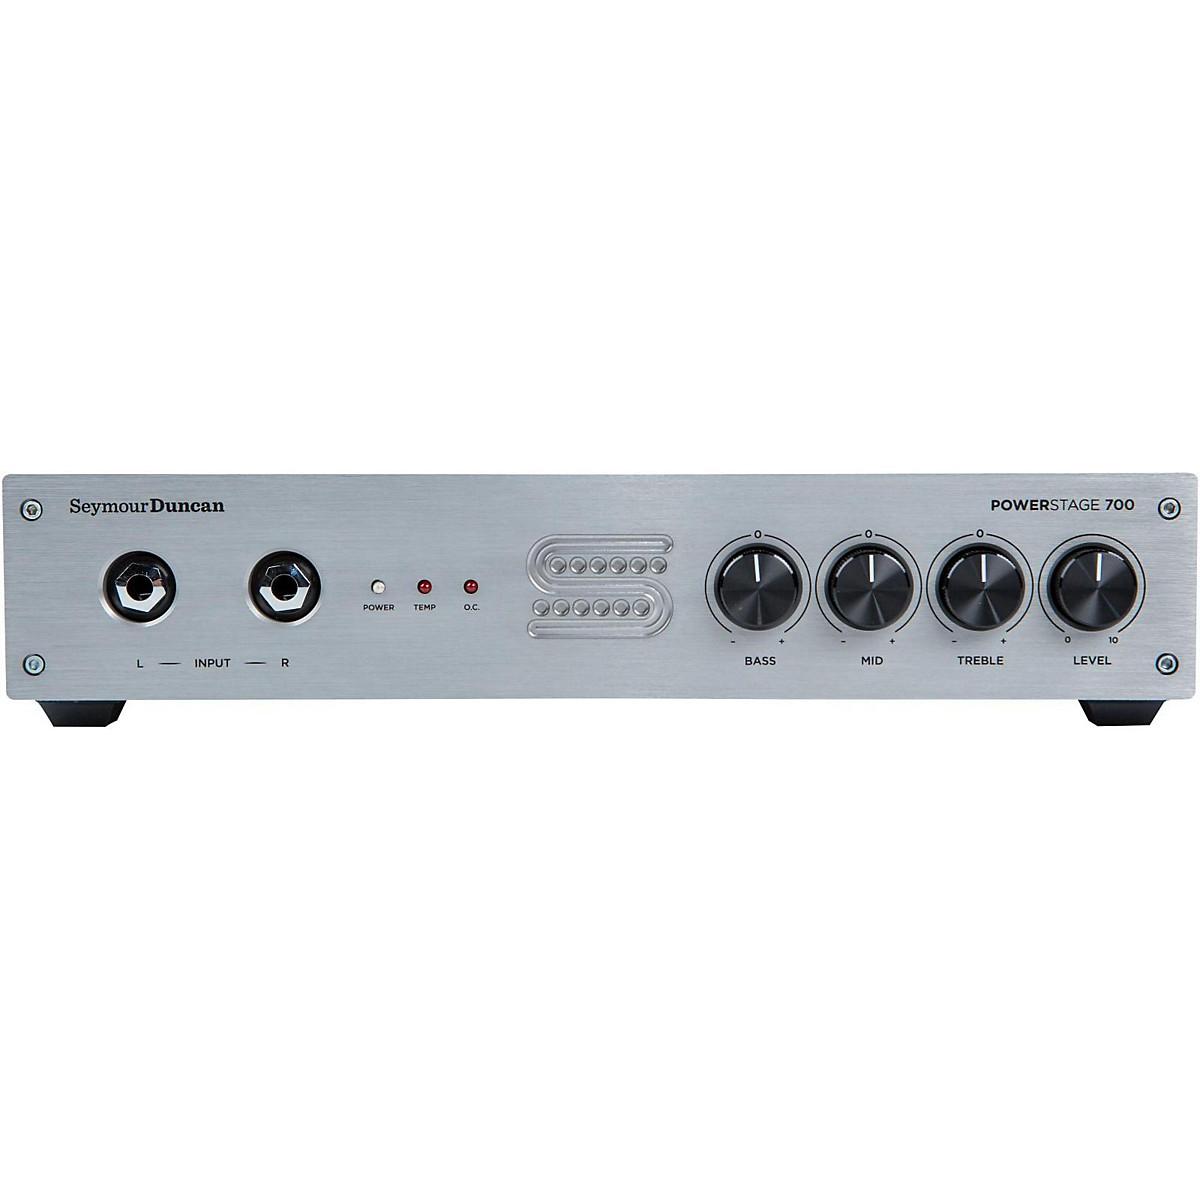 Seymour Duncan PowerStage 700 700W Guitar Amp Head